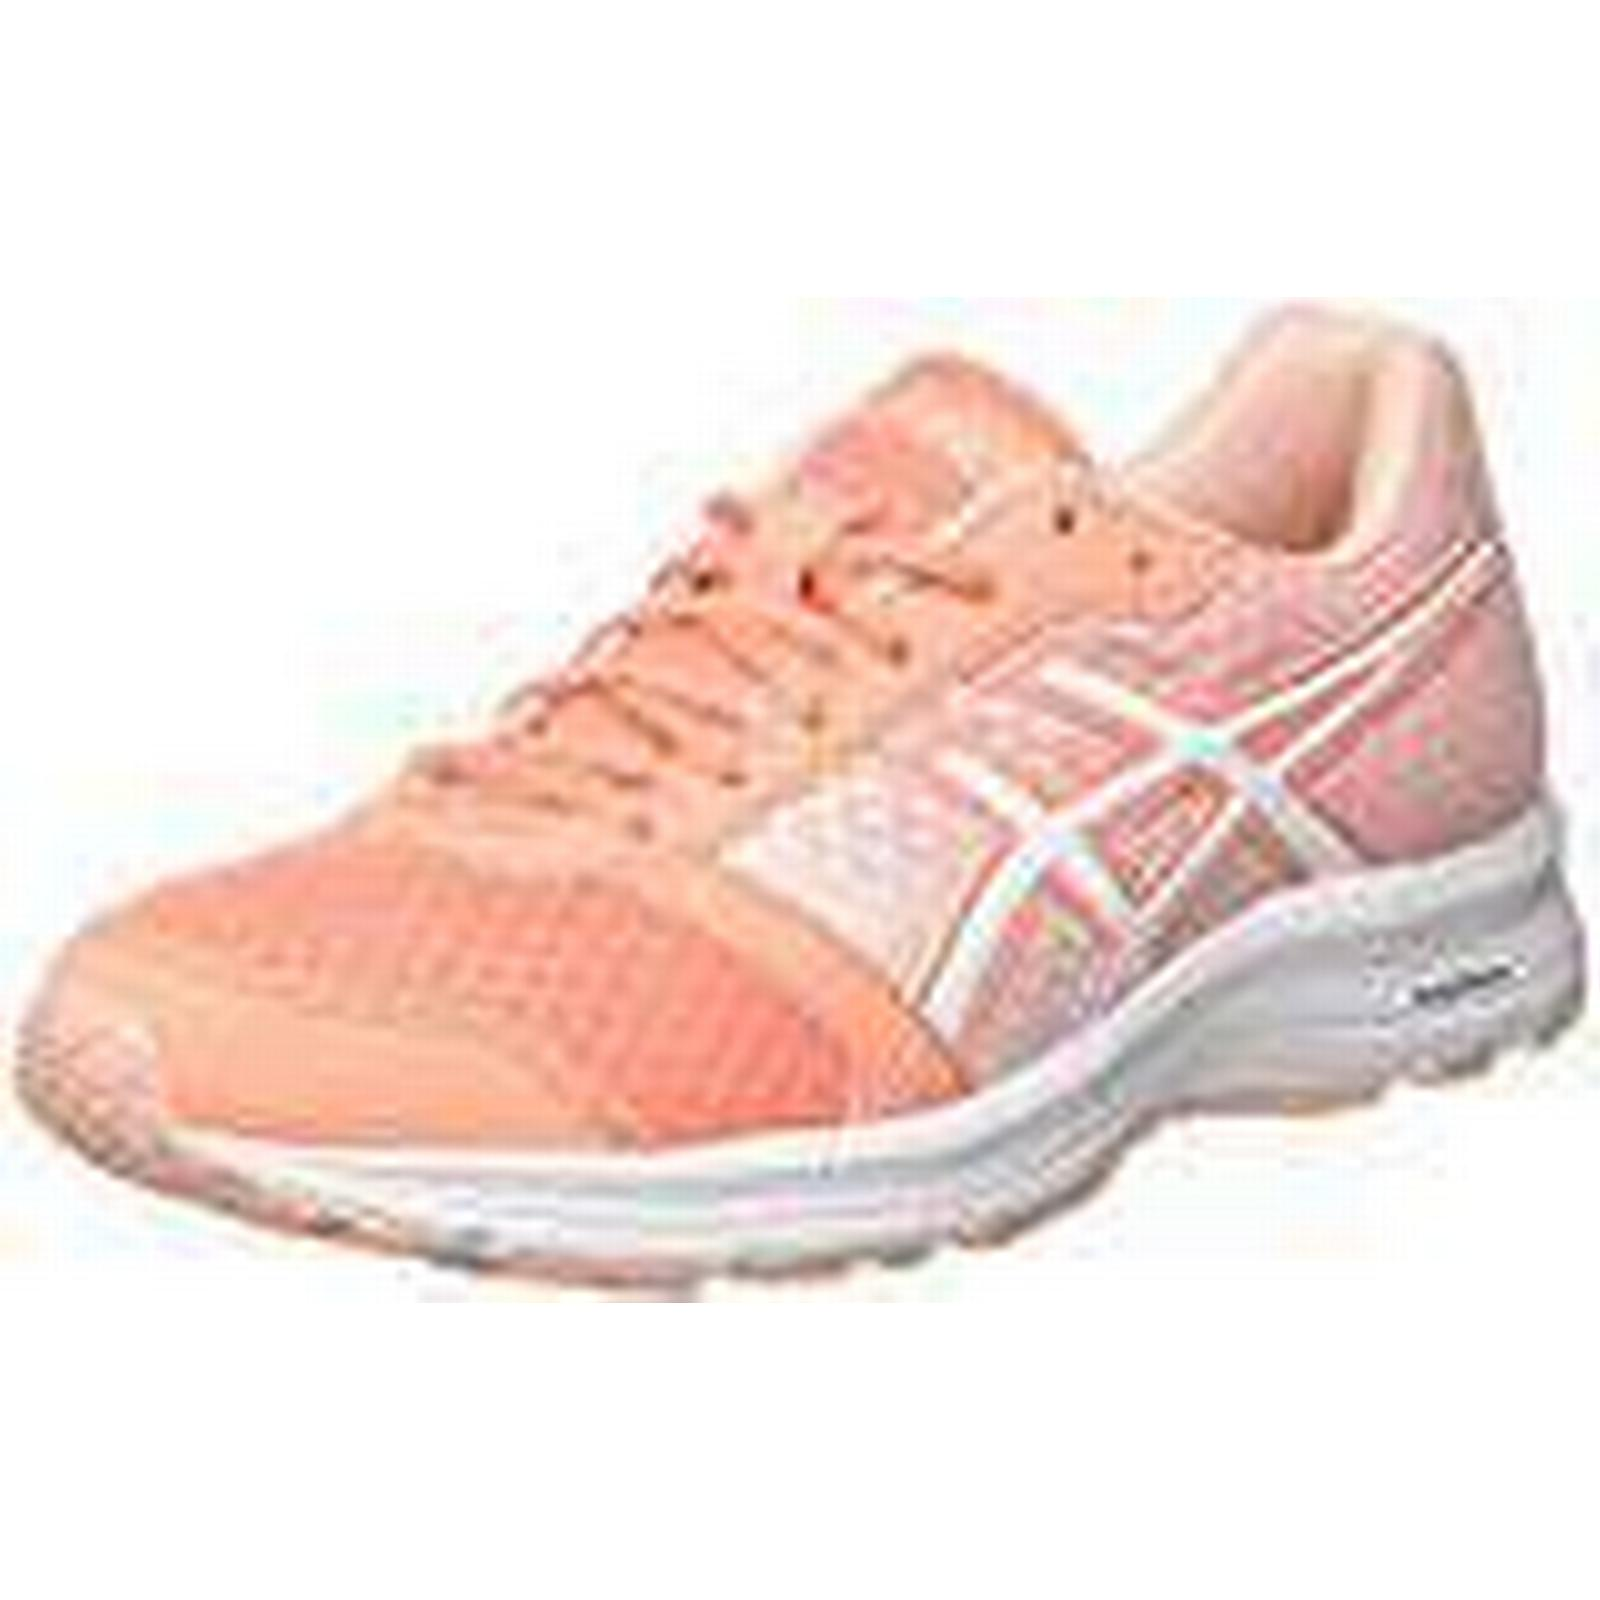 Asics Women''s Patriot 9 Training 0601), Shoes, (Begonia White/Seashell Pink 0601), Training 37 EU (4 UK) fab165